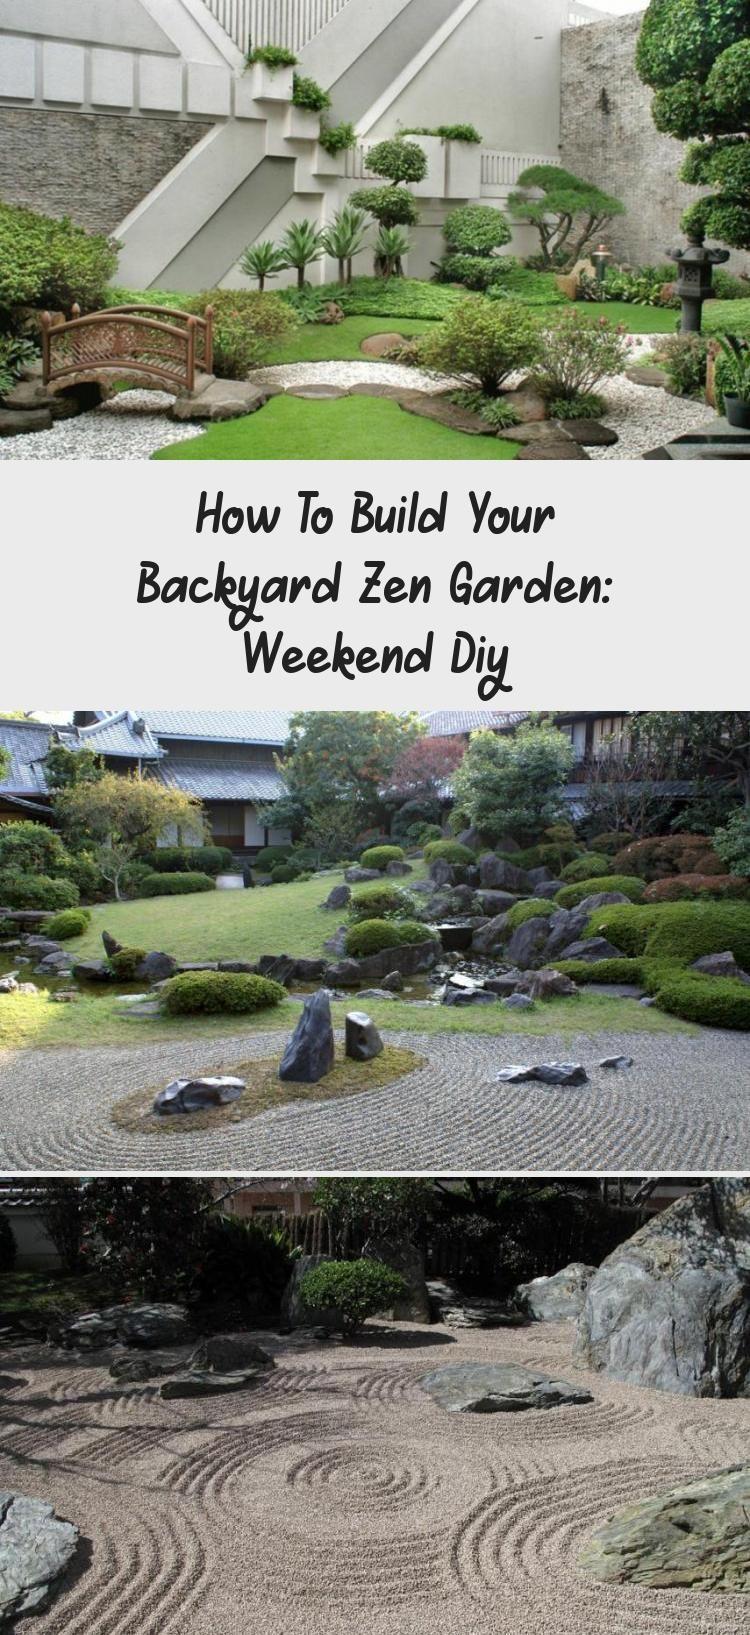 Buddha Face Zen Garden Zengardenseating Zengardenarchitecture Zengardendrawing Zengardenterrace Makale Zen Garden Backyard Zen Garden Zen Garden Diy Diy backyard zen garden